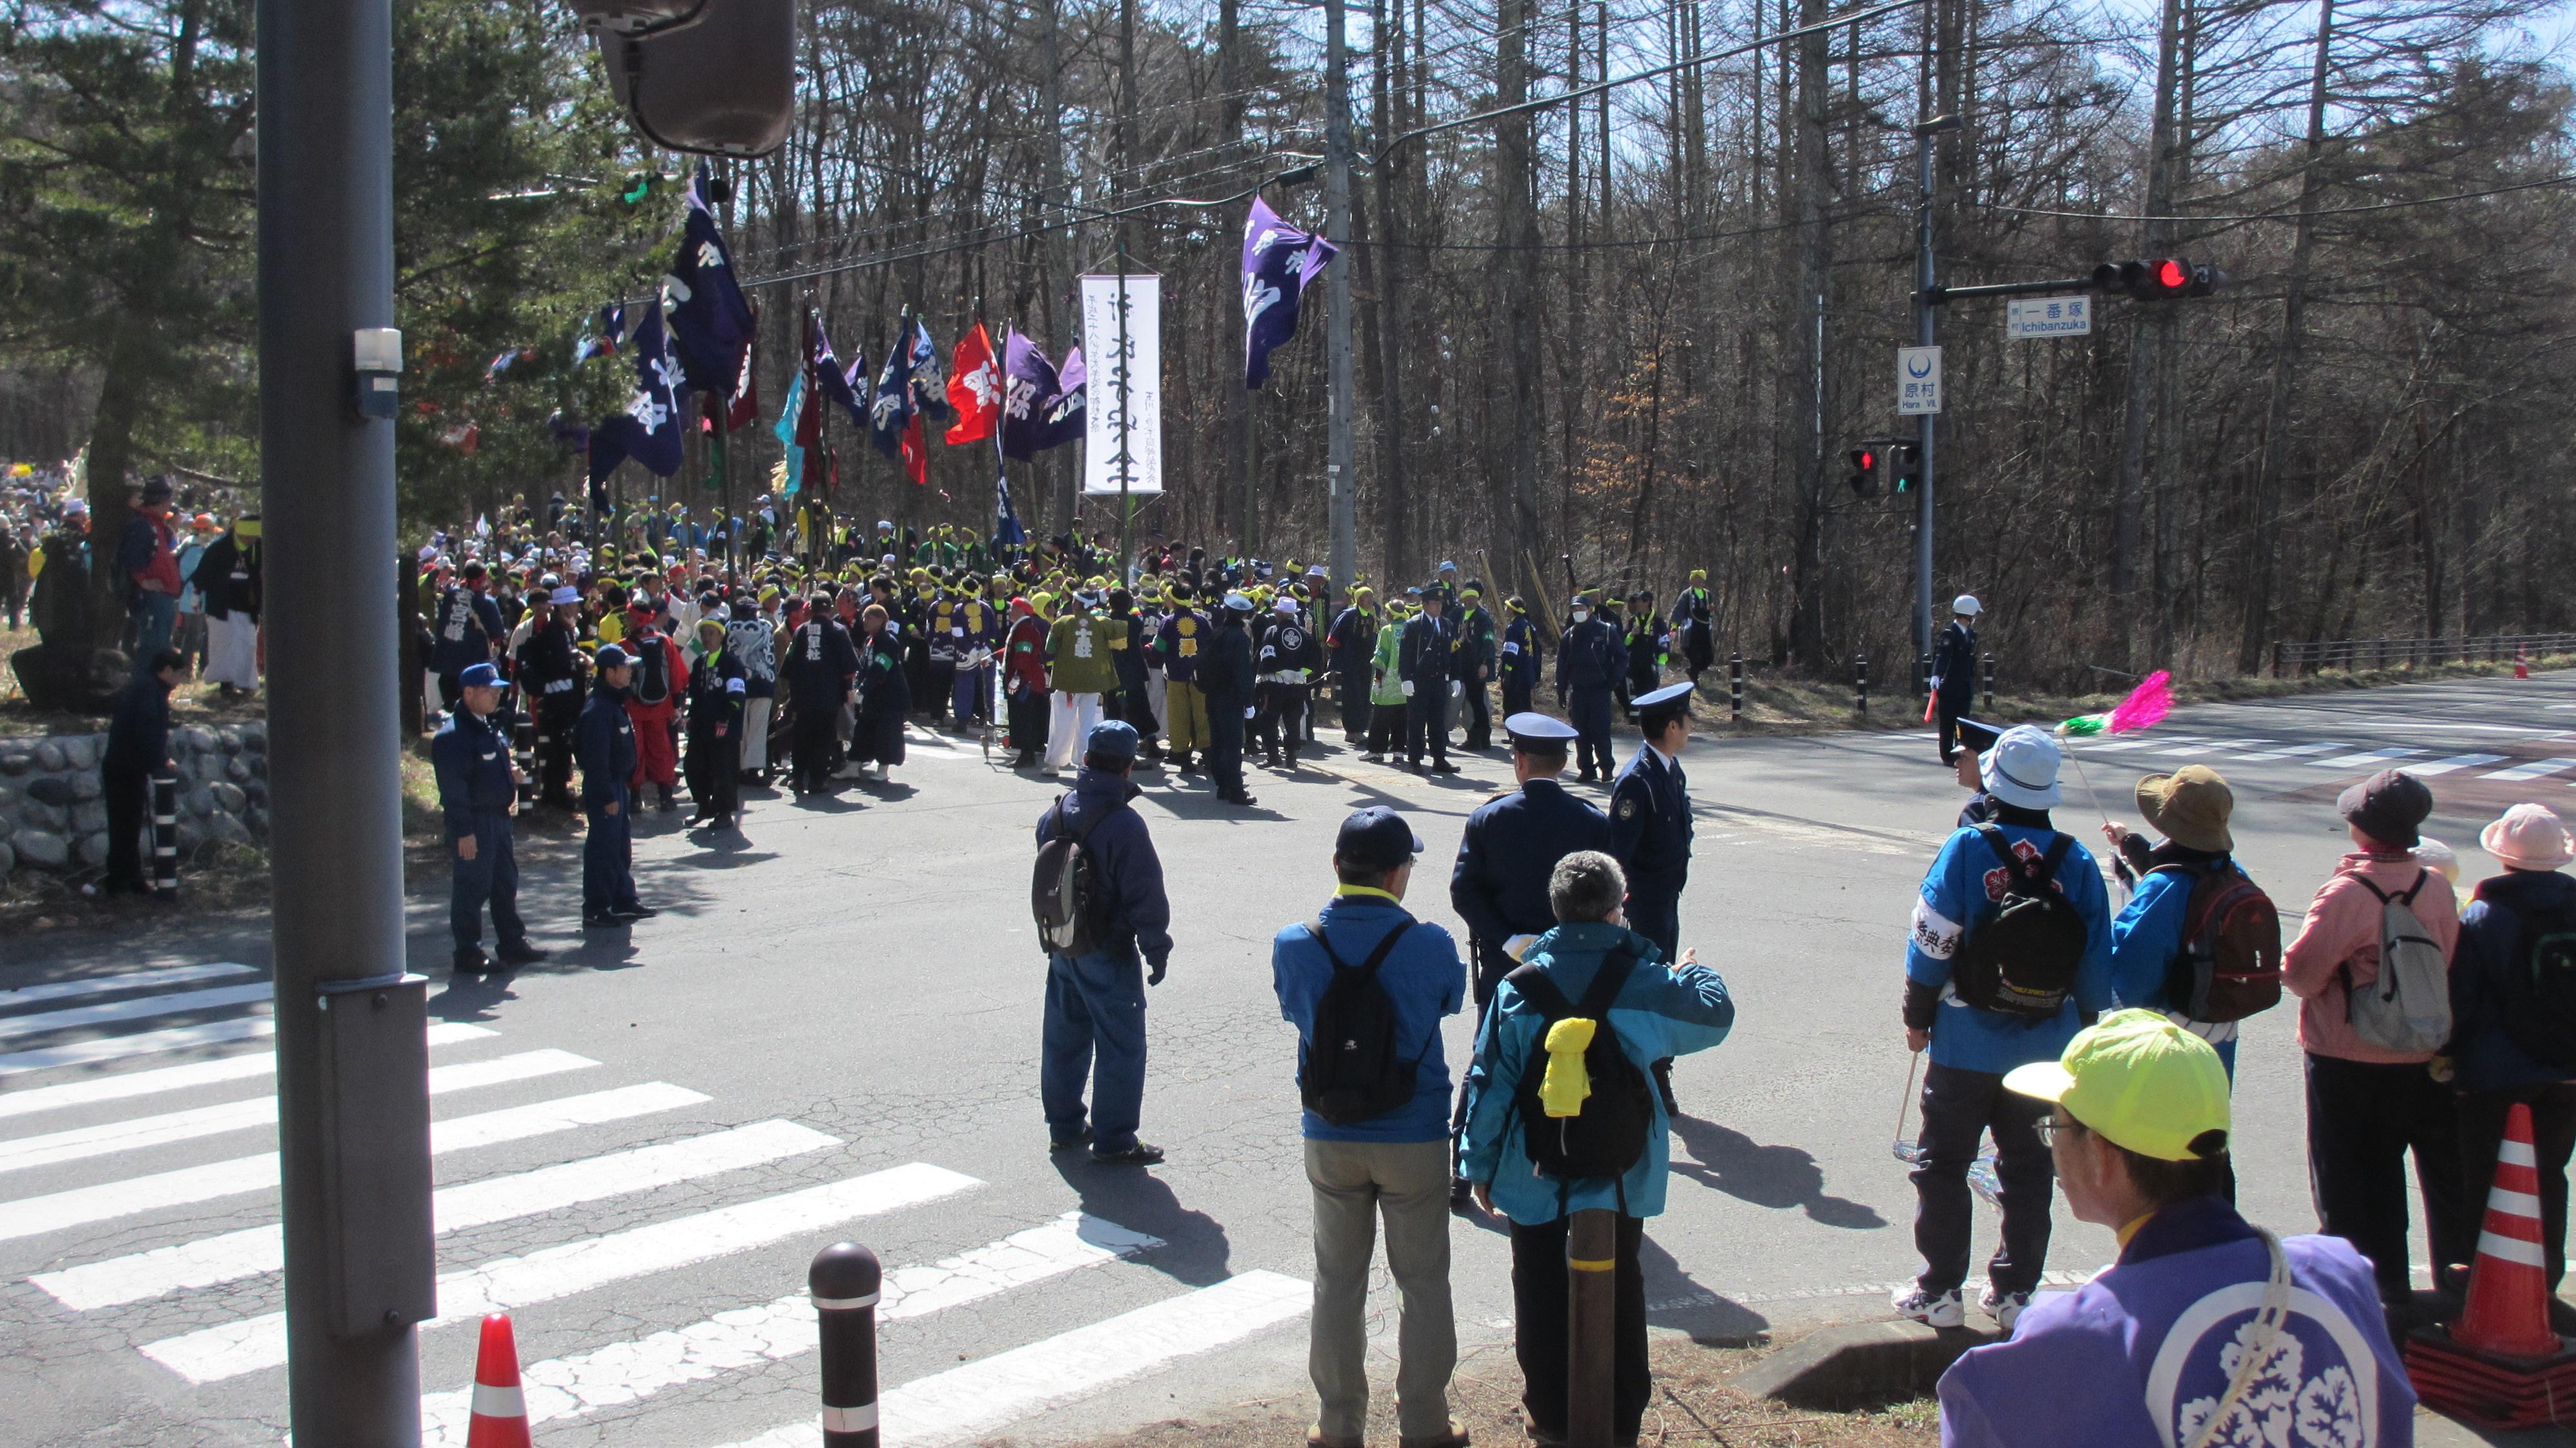 http://www.alpico.co.jp/shikinomori/news/images/IMG_5750.JPG